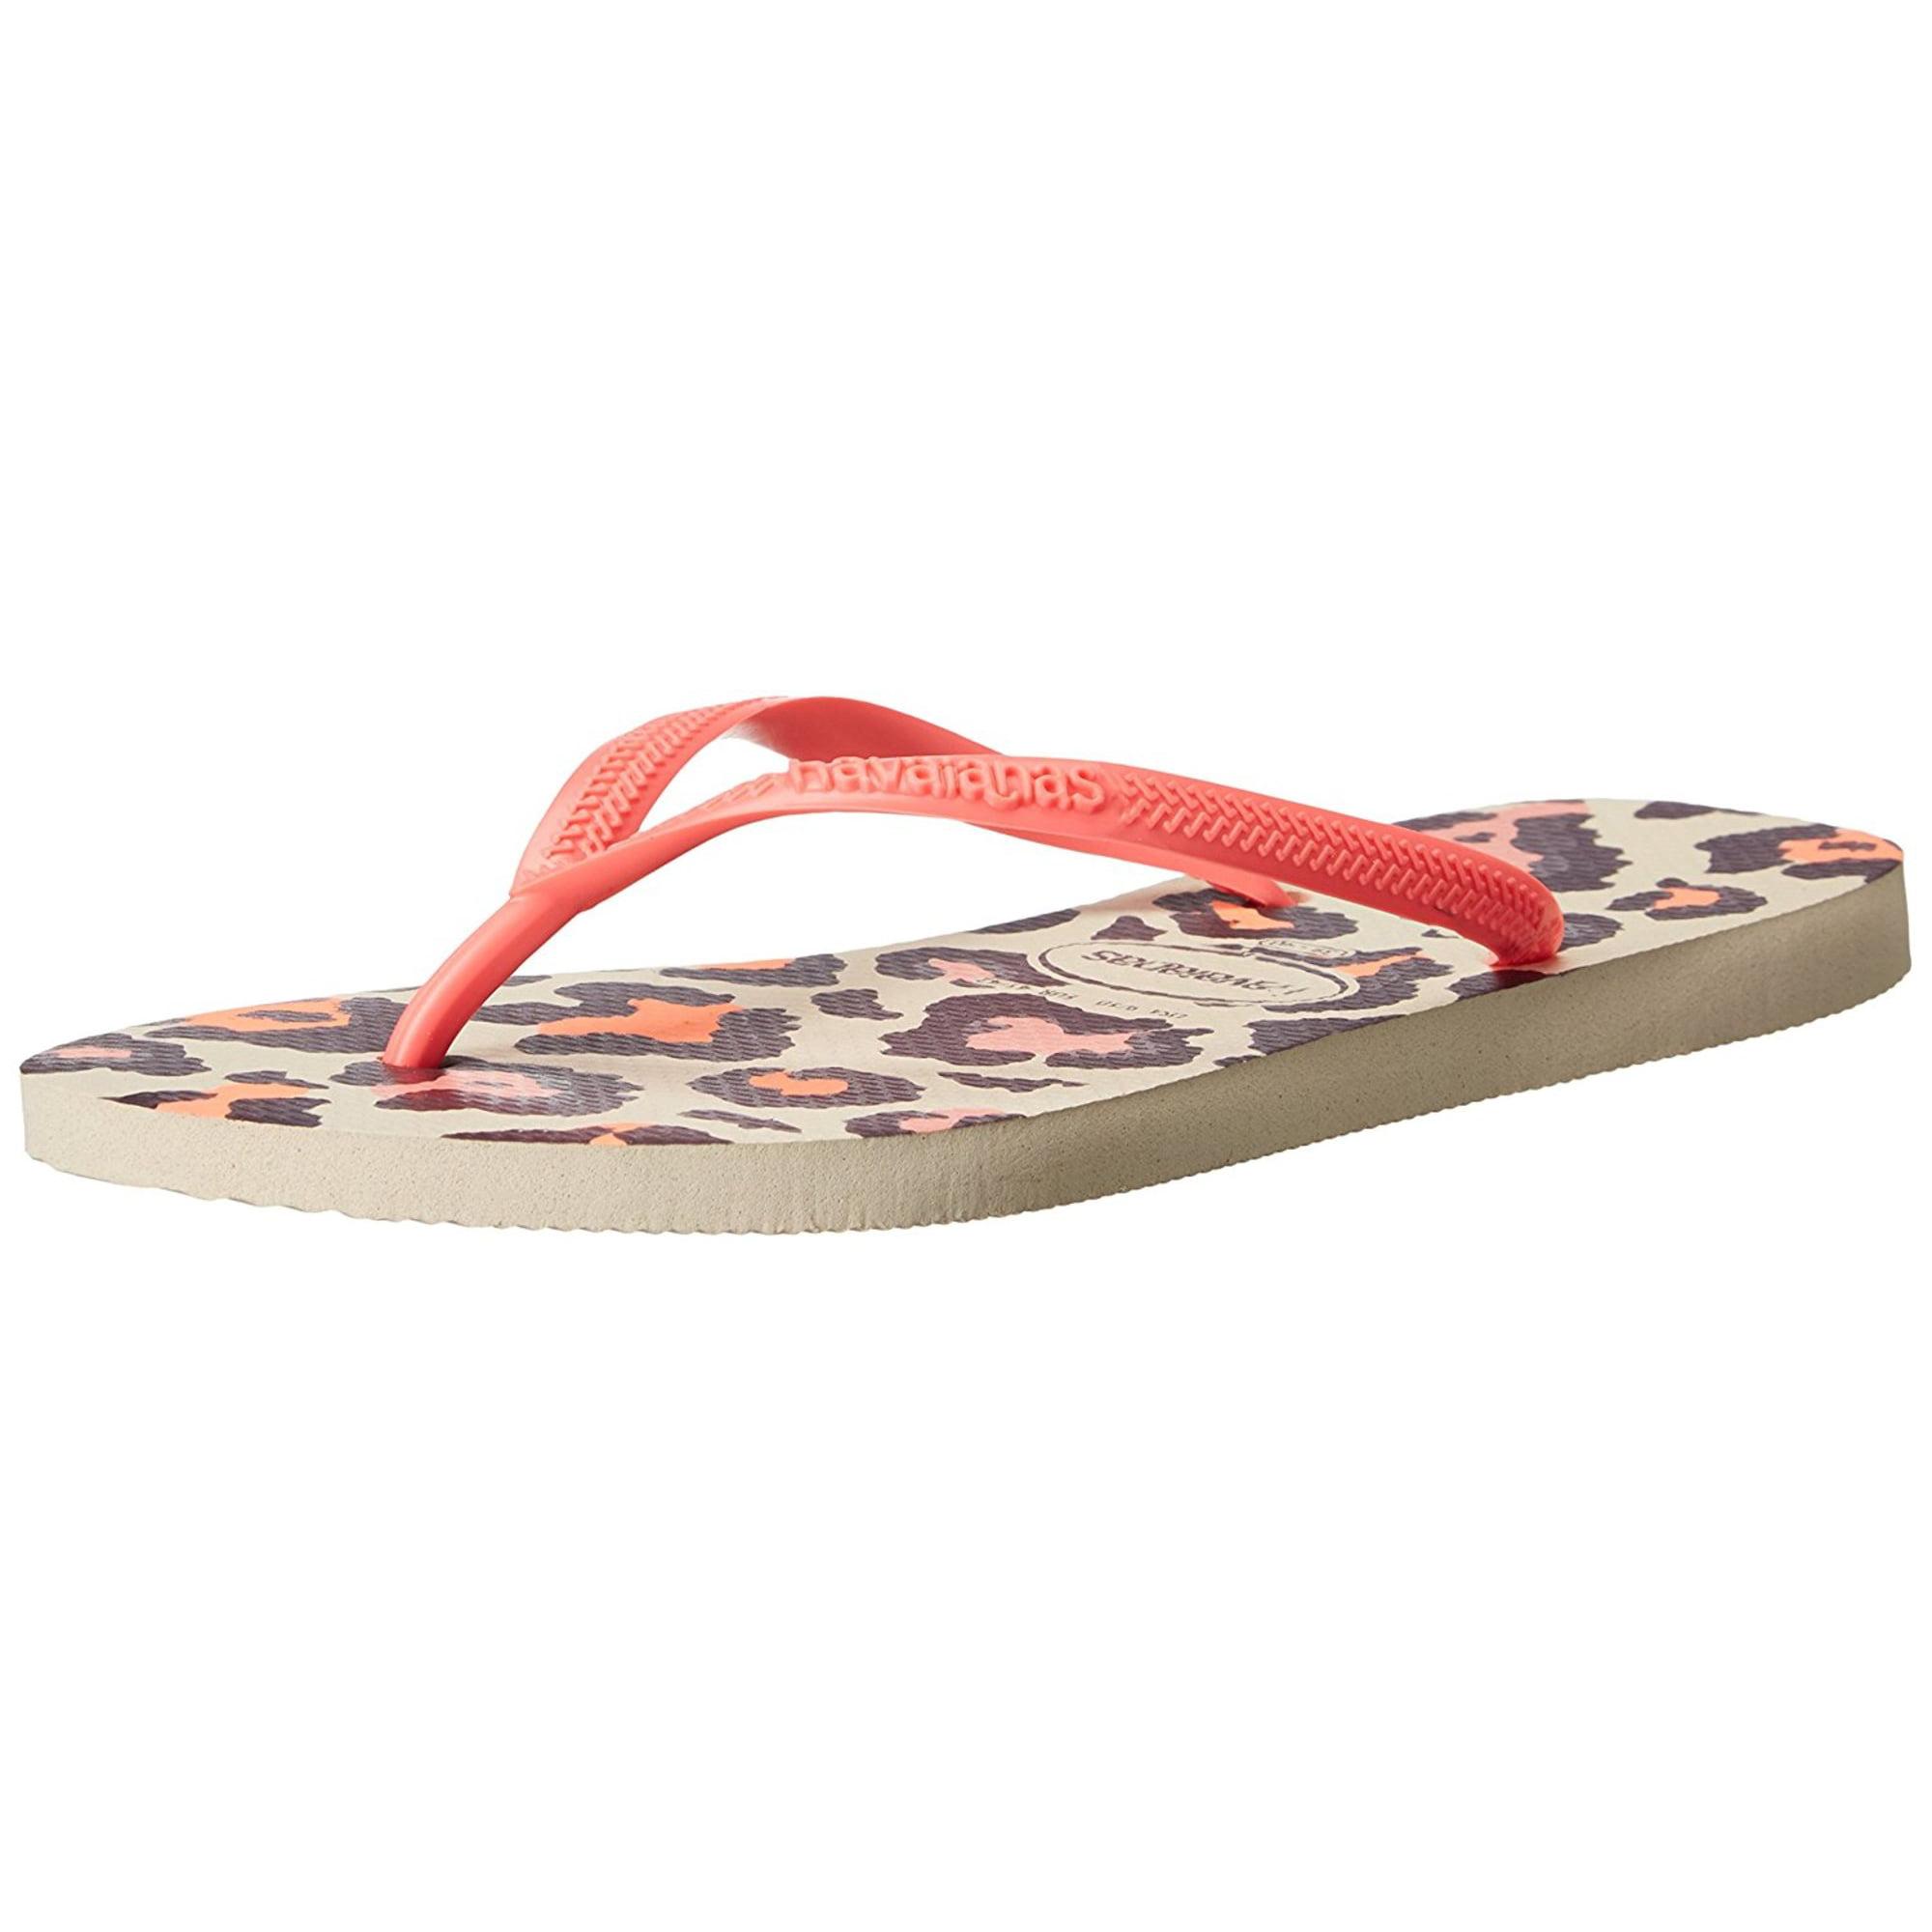 92f55b14f Havaianas Womens Slim Animals Round Toe Beach Slide